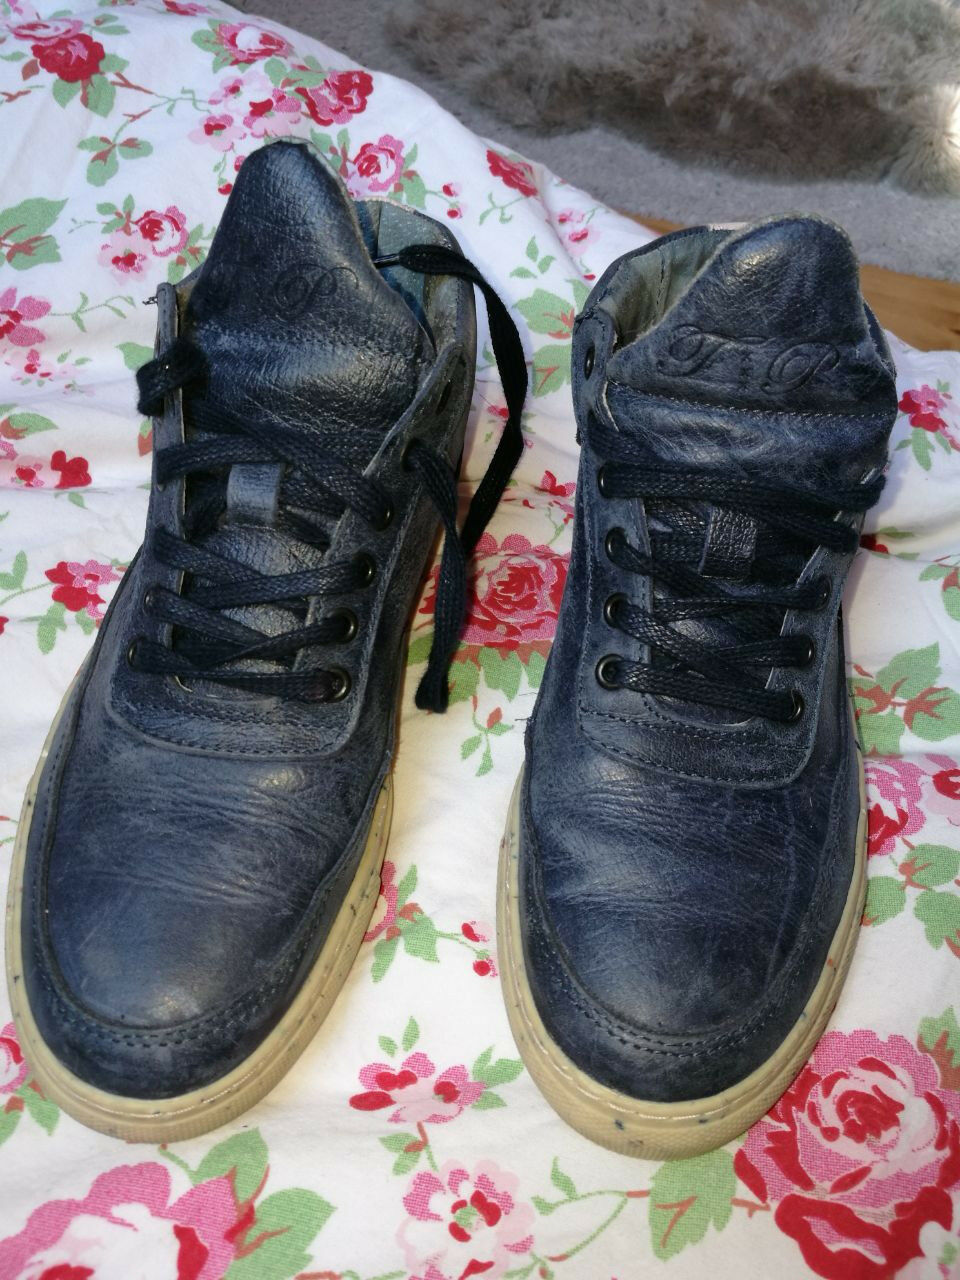 Filling Schuhe Pieces Sneaker dunkelblau rosa EUR 36 Schuhe Filling bequem luxus hoher NP 57c512